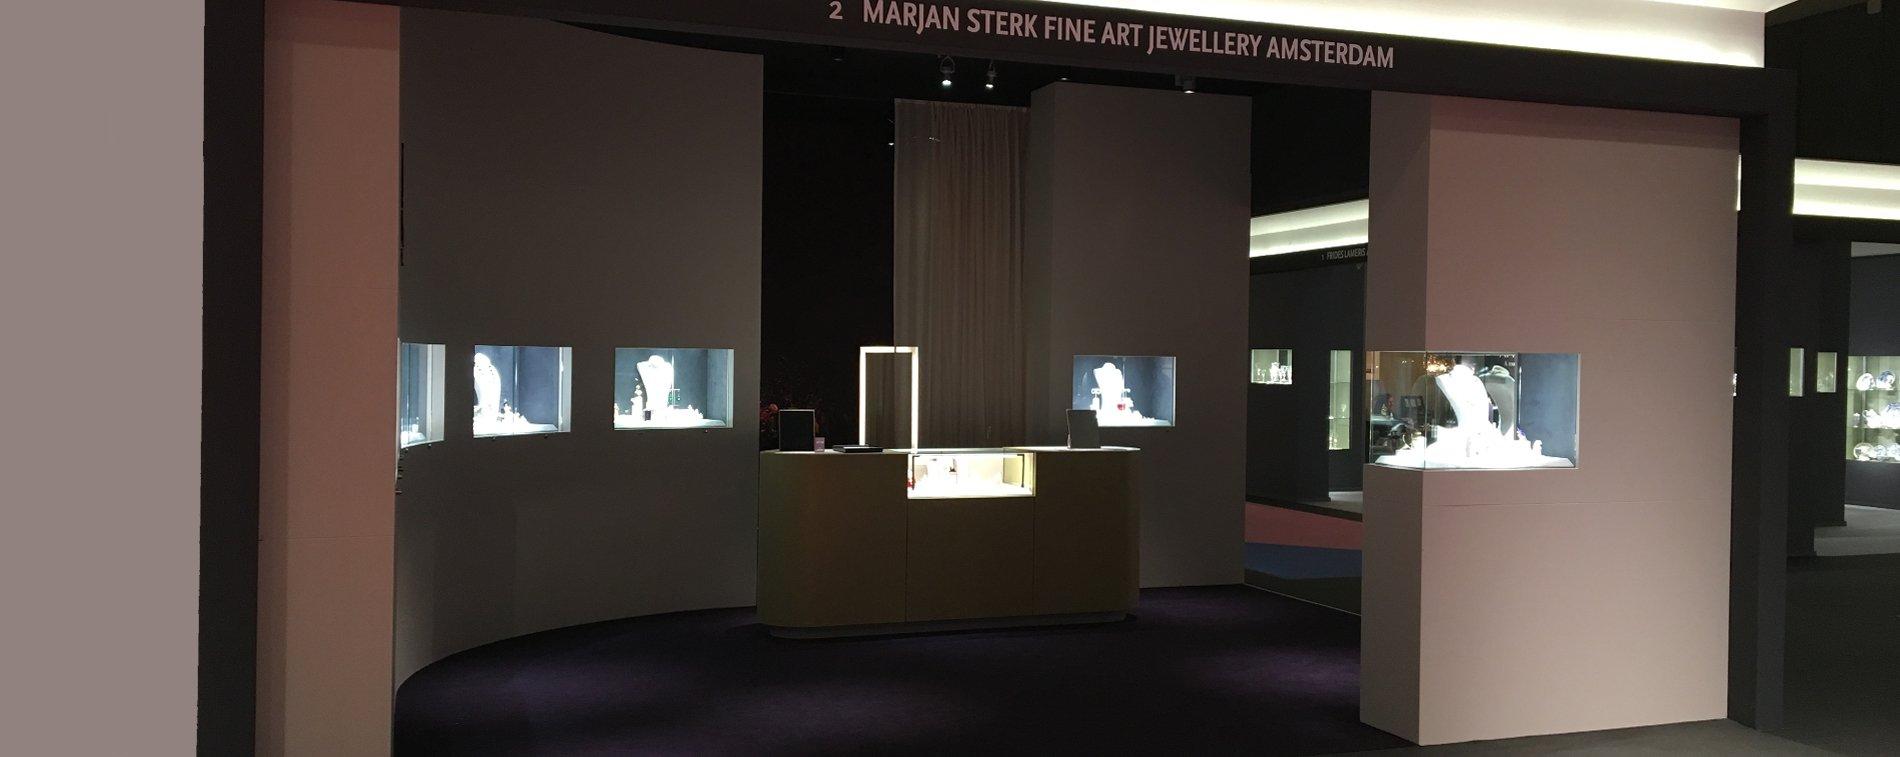 marjan sterk fine art jewellery pan amsterdam antiques show